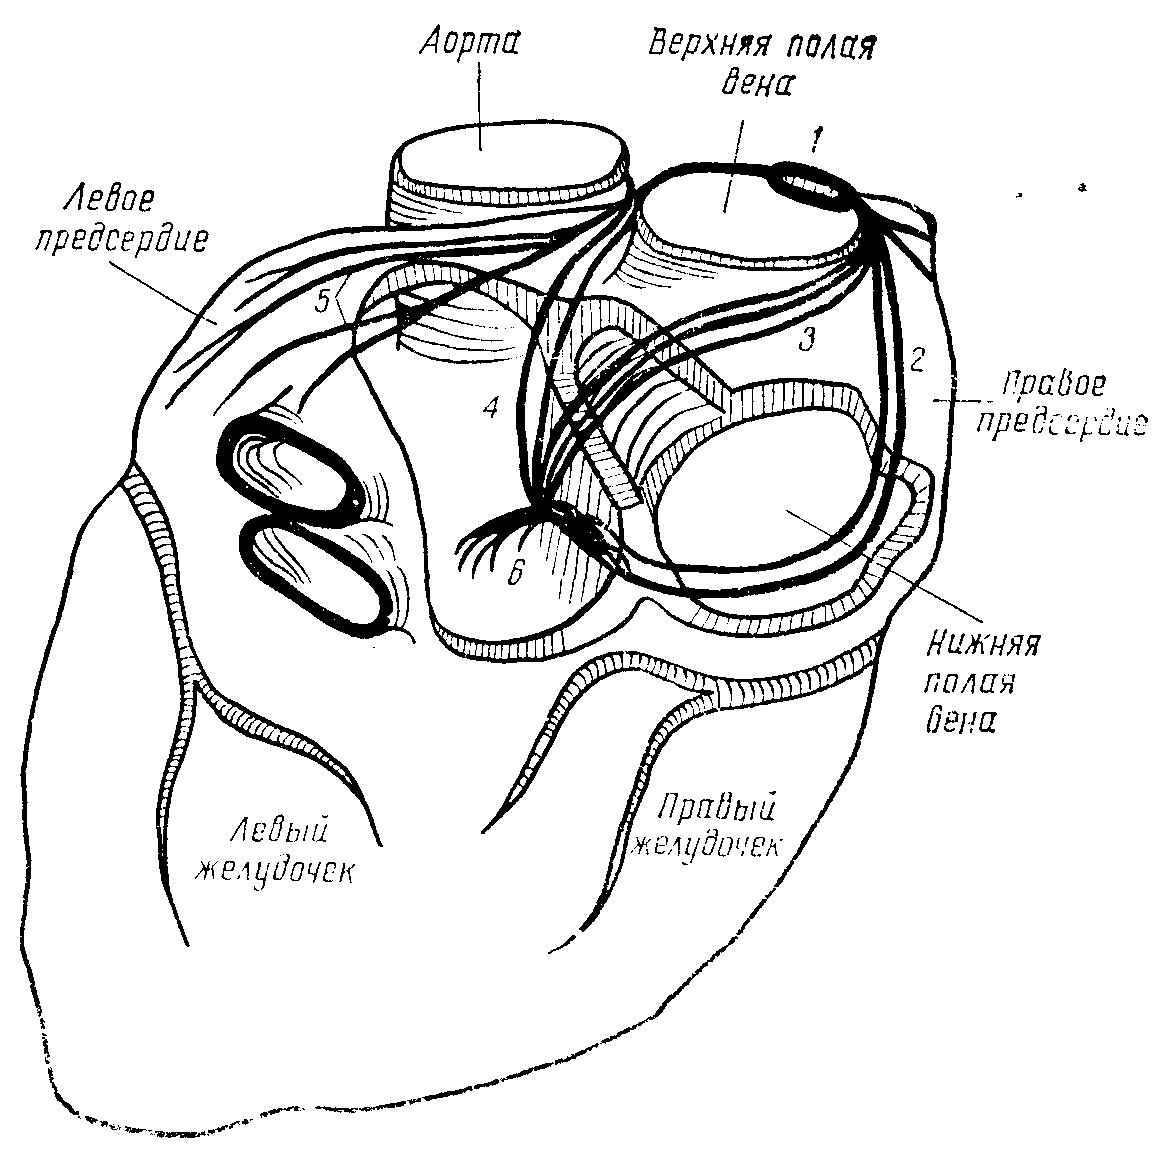 Атриовентрикулярный узел (предсердно-желудочковый, Ашоффа-Тавара)